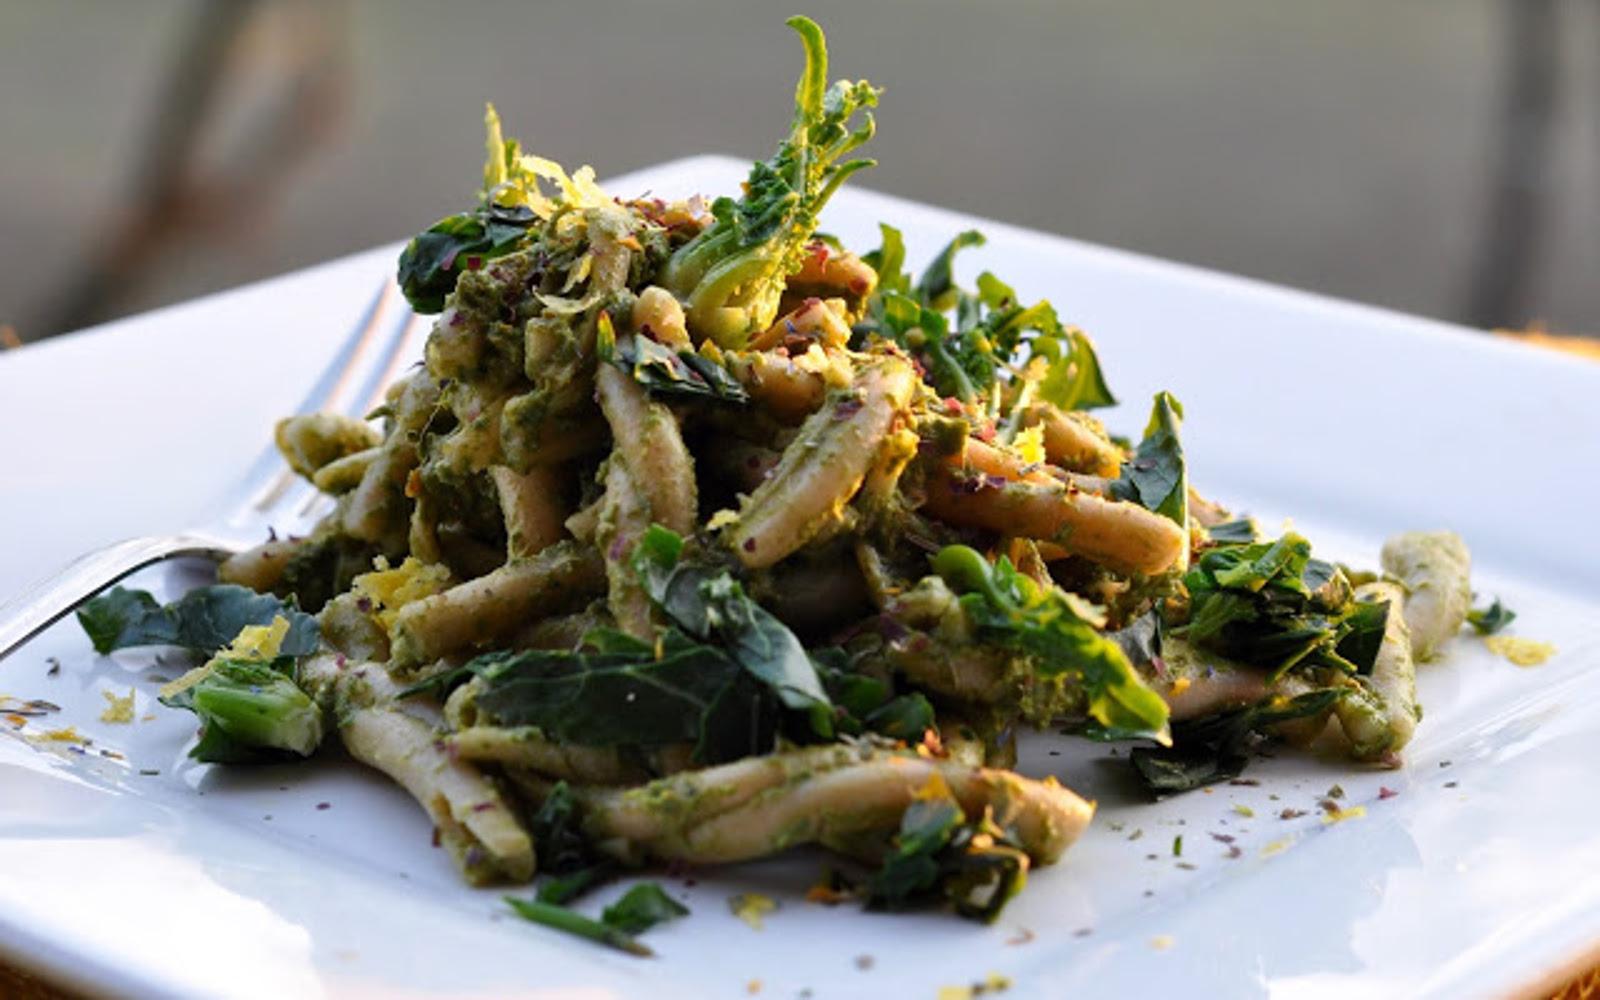 Pasta With Broccoli and Bean Pesto